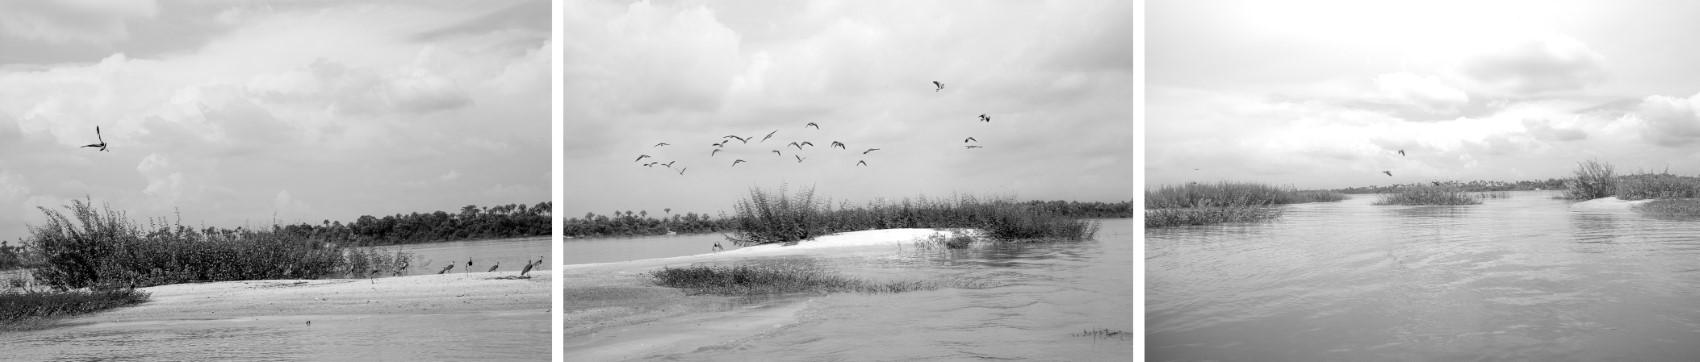 Pássaros - TO - Brasil